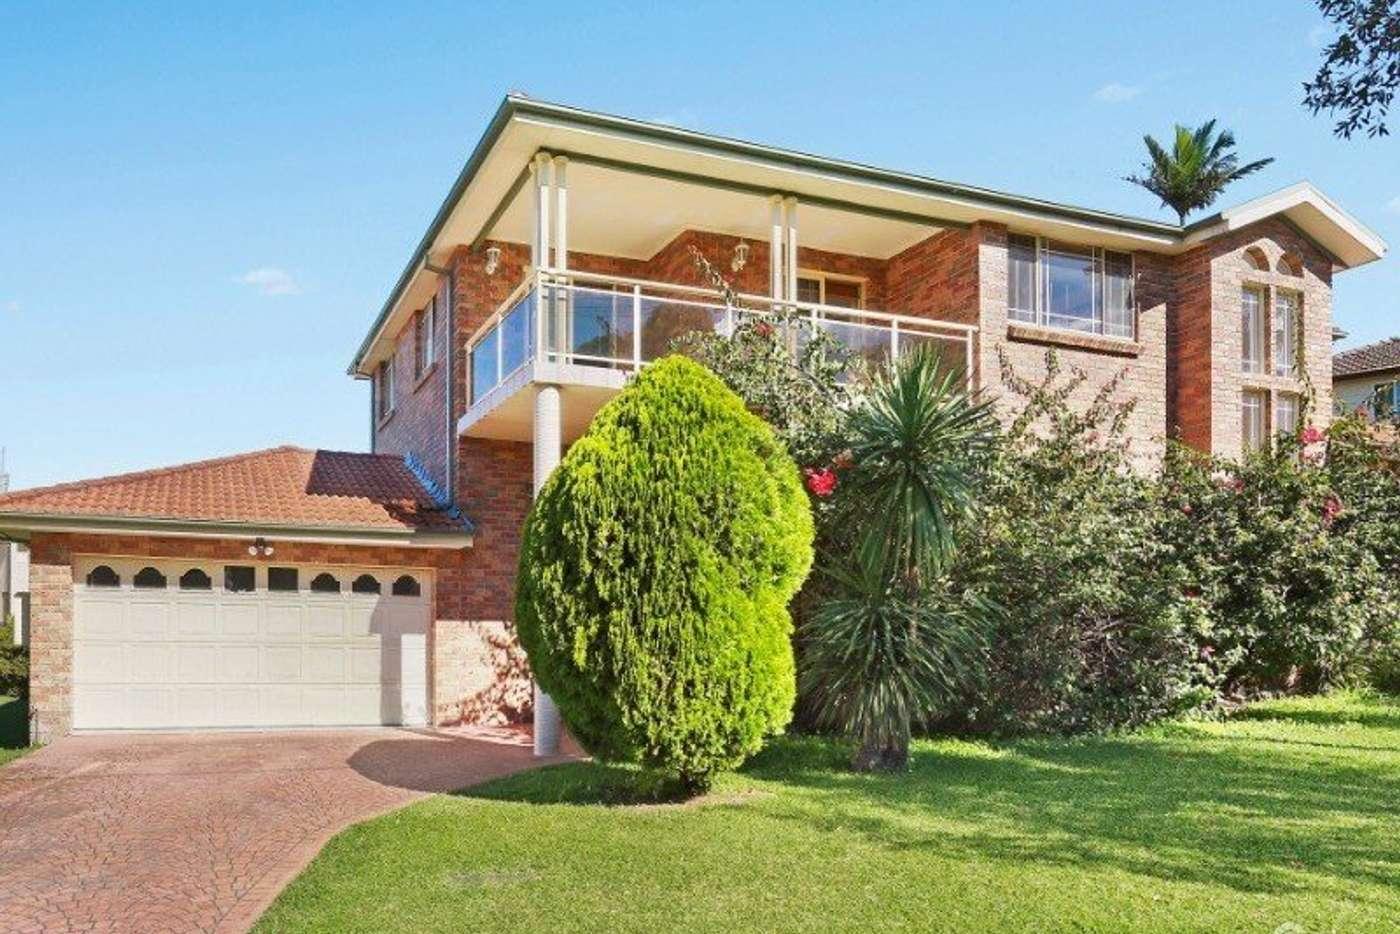 Main view of Homely house listing, 39 Thomas Street, Hurstville NSW 2220